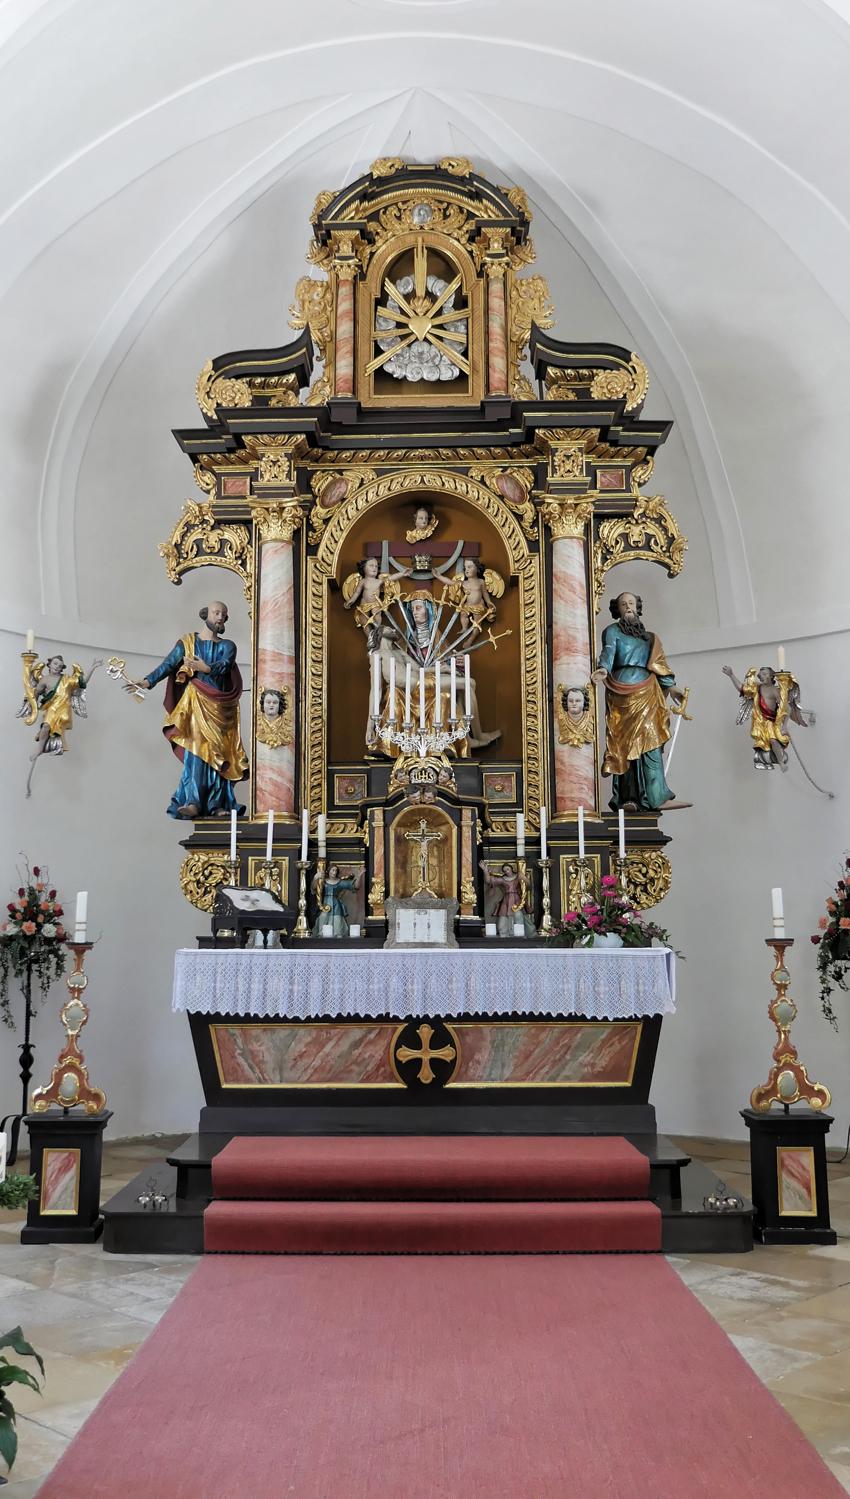 2021 04 26 aoelfb wallfahrtskirche mariae himmelfahrt atzberg11